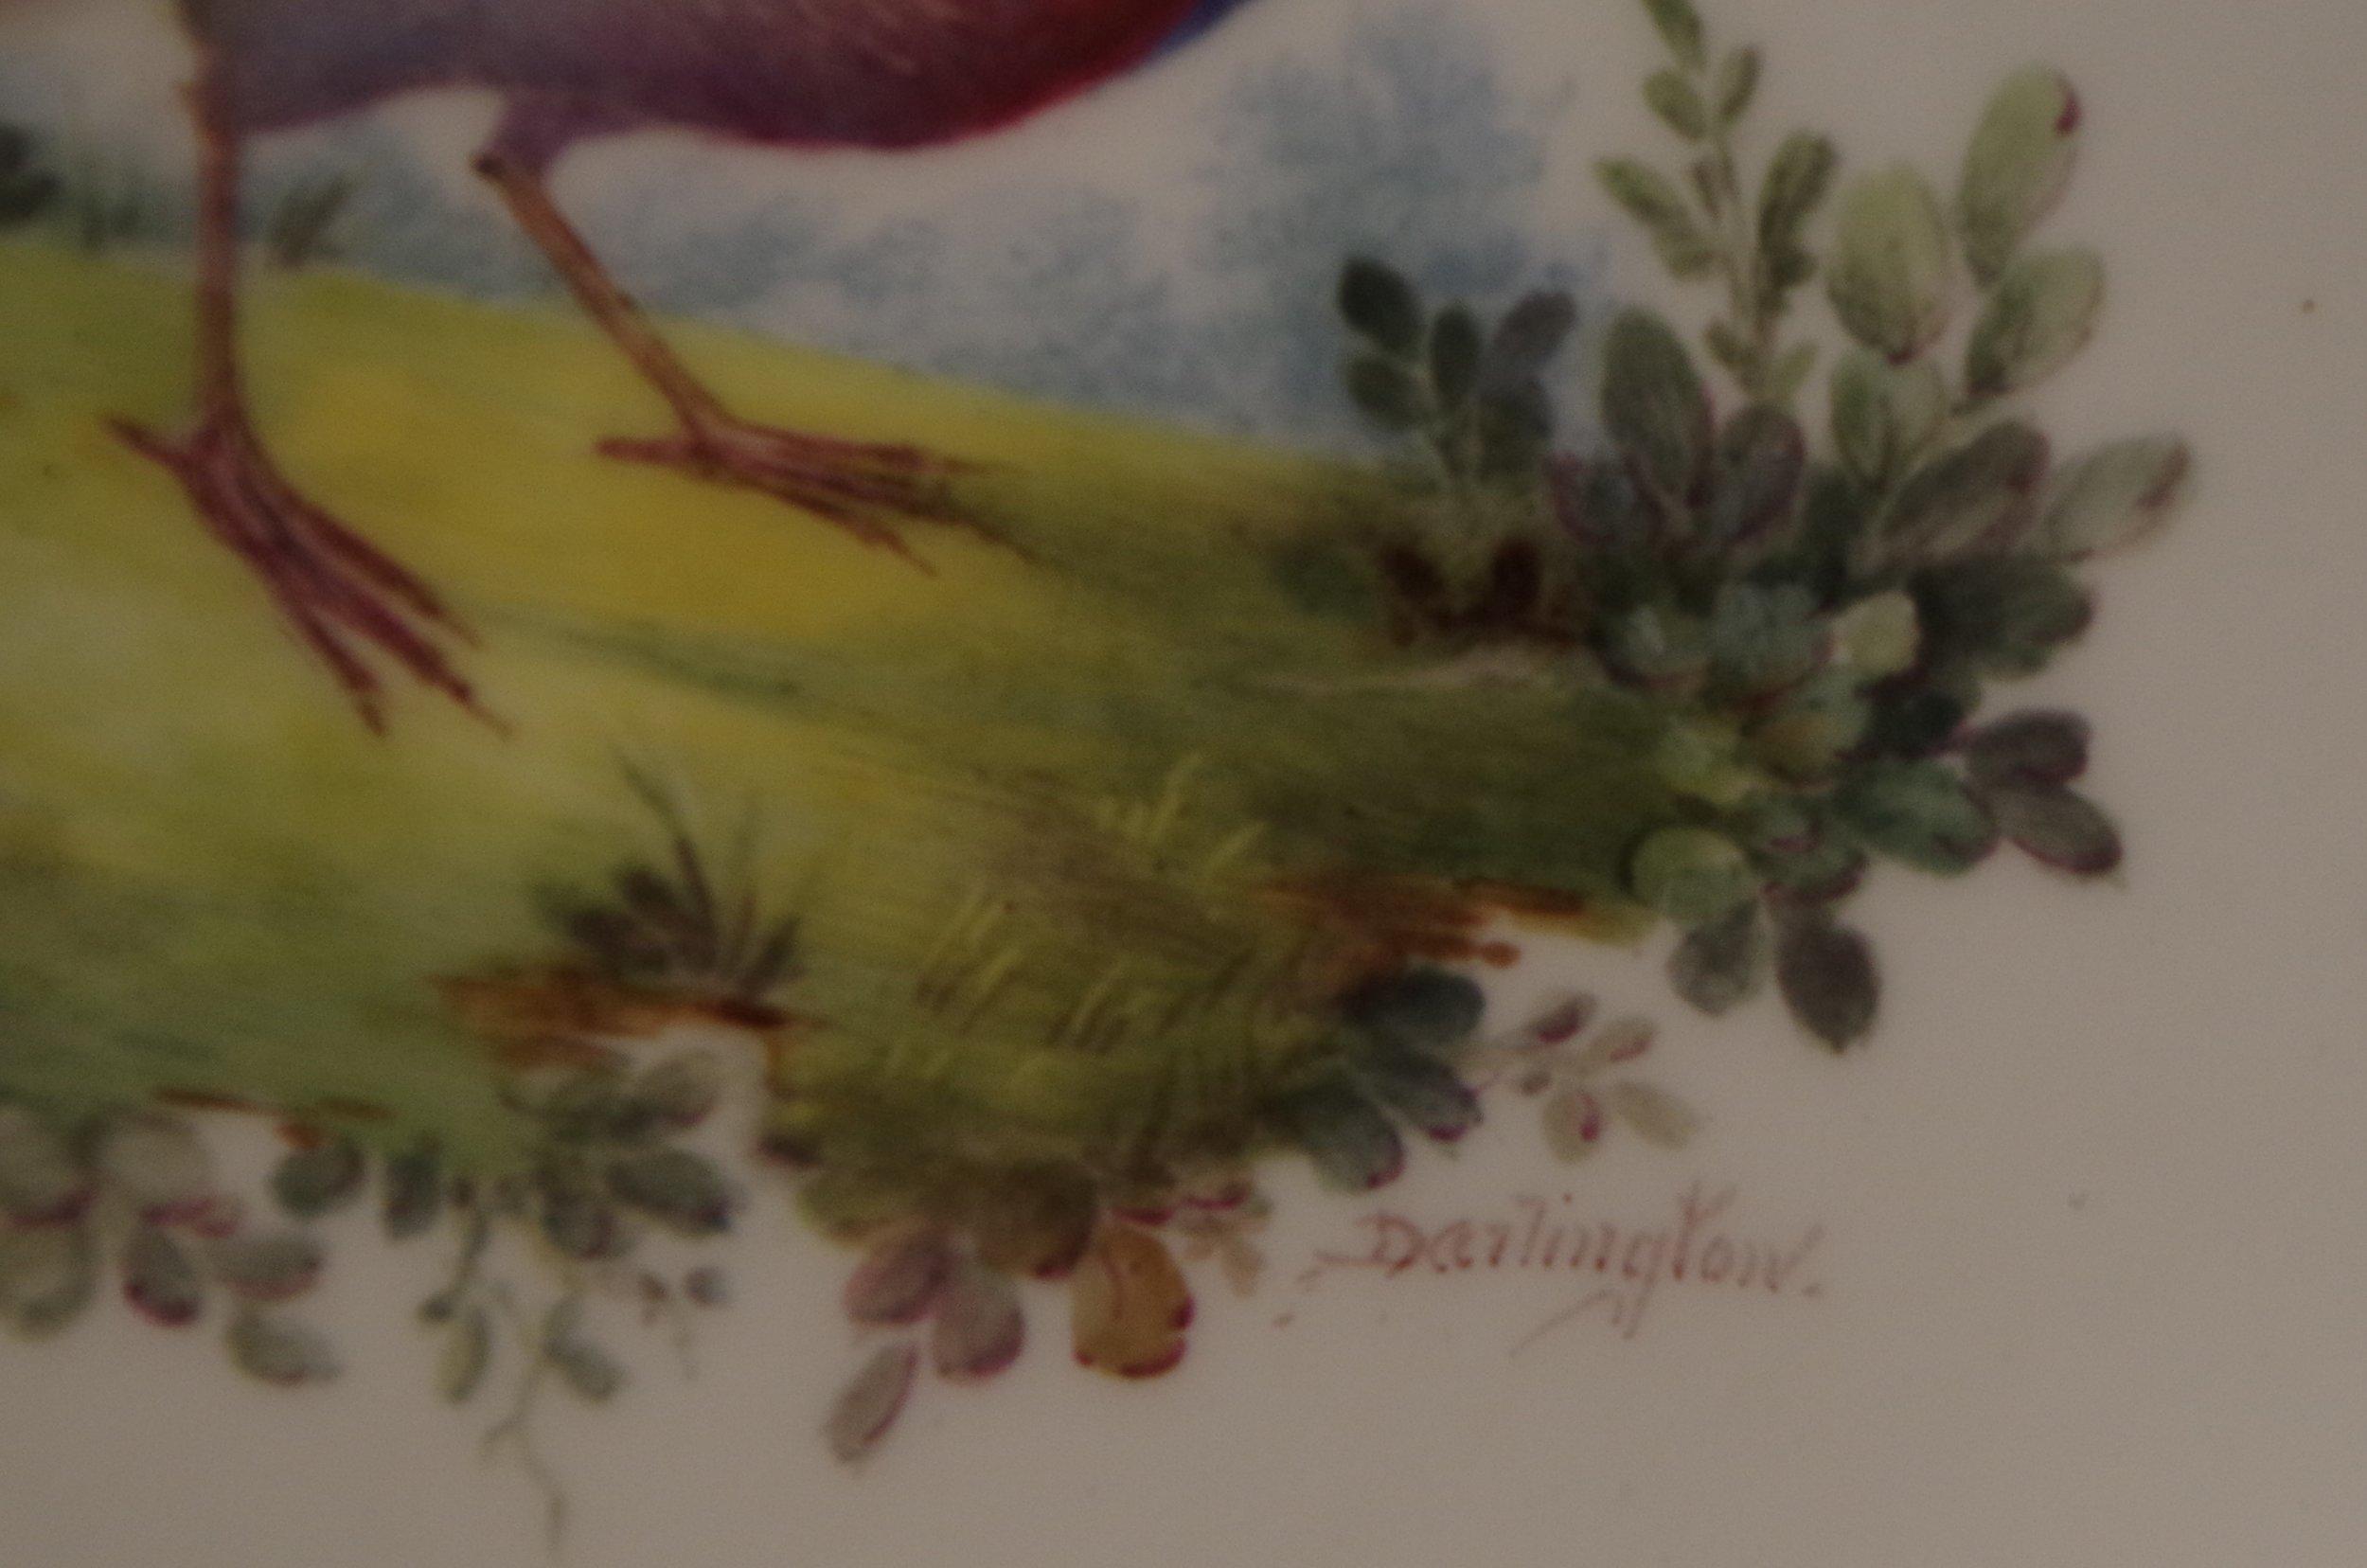 royal-crown-derby-clarence-shape-green-ground-to-rim-bird-centre-close-up-darlington-signature-1921